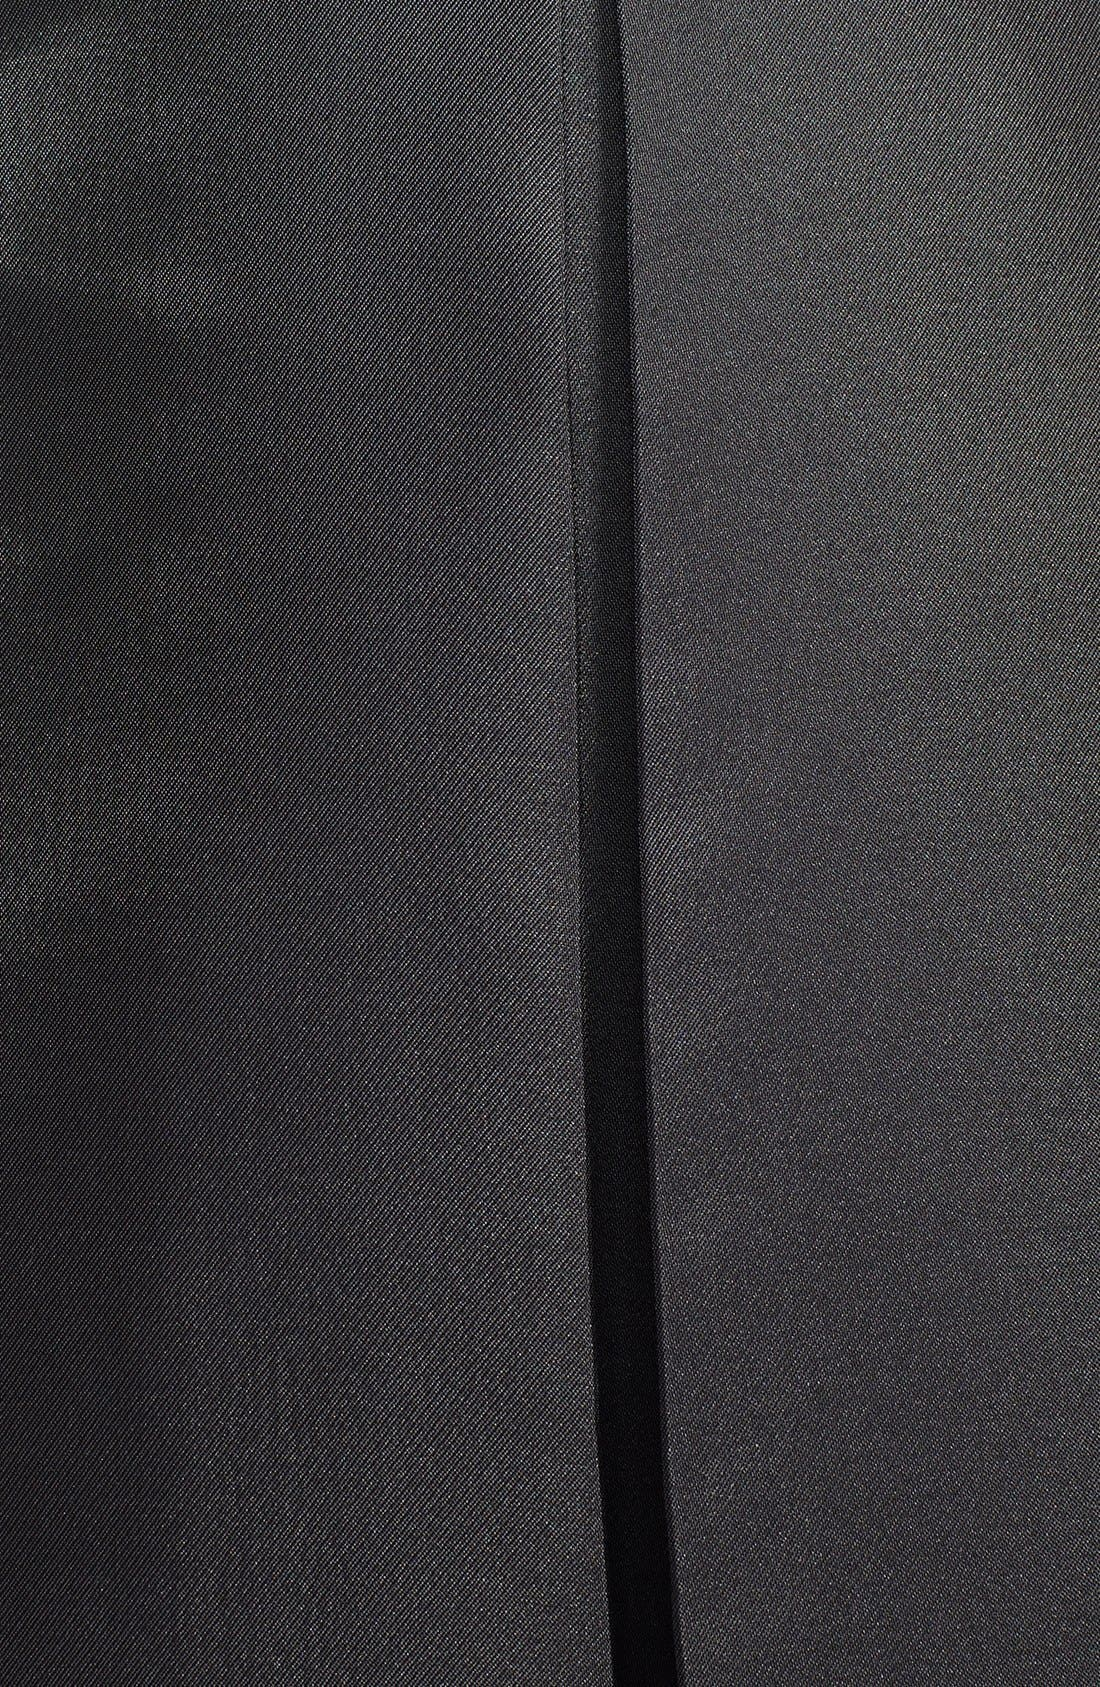 Pleat Midi Skirt,                             Alternate thumbnail 5, color,                             001